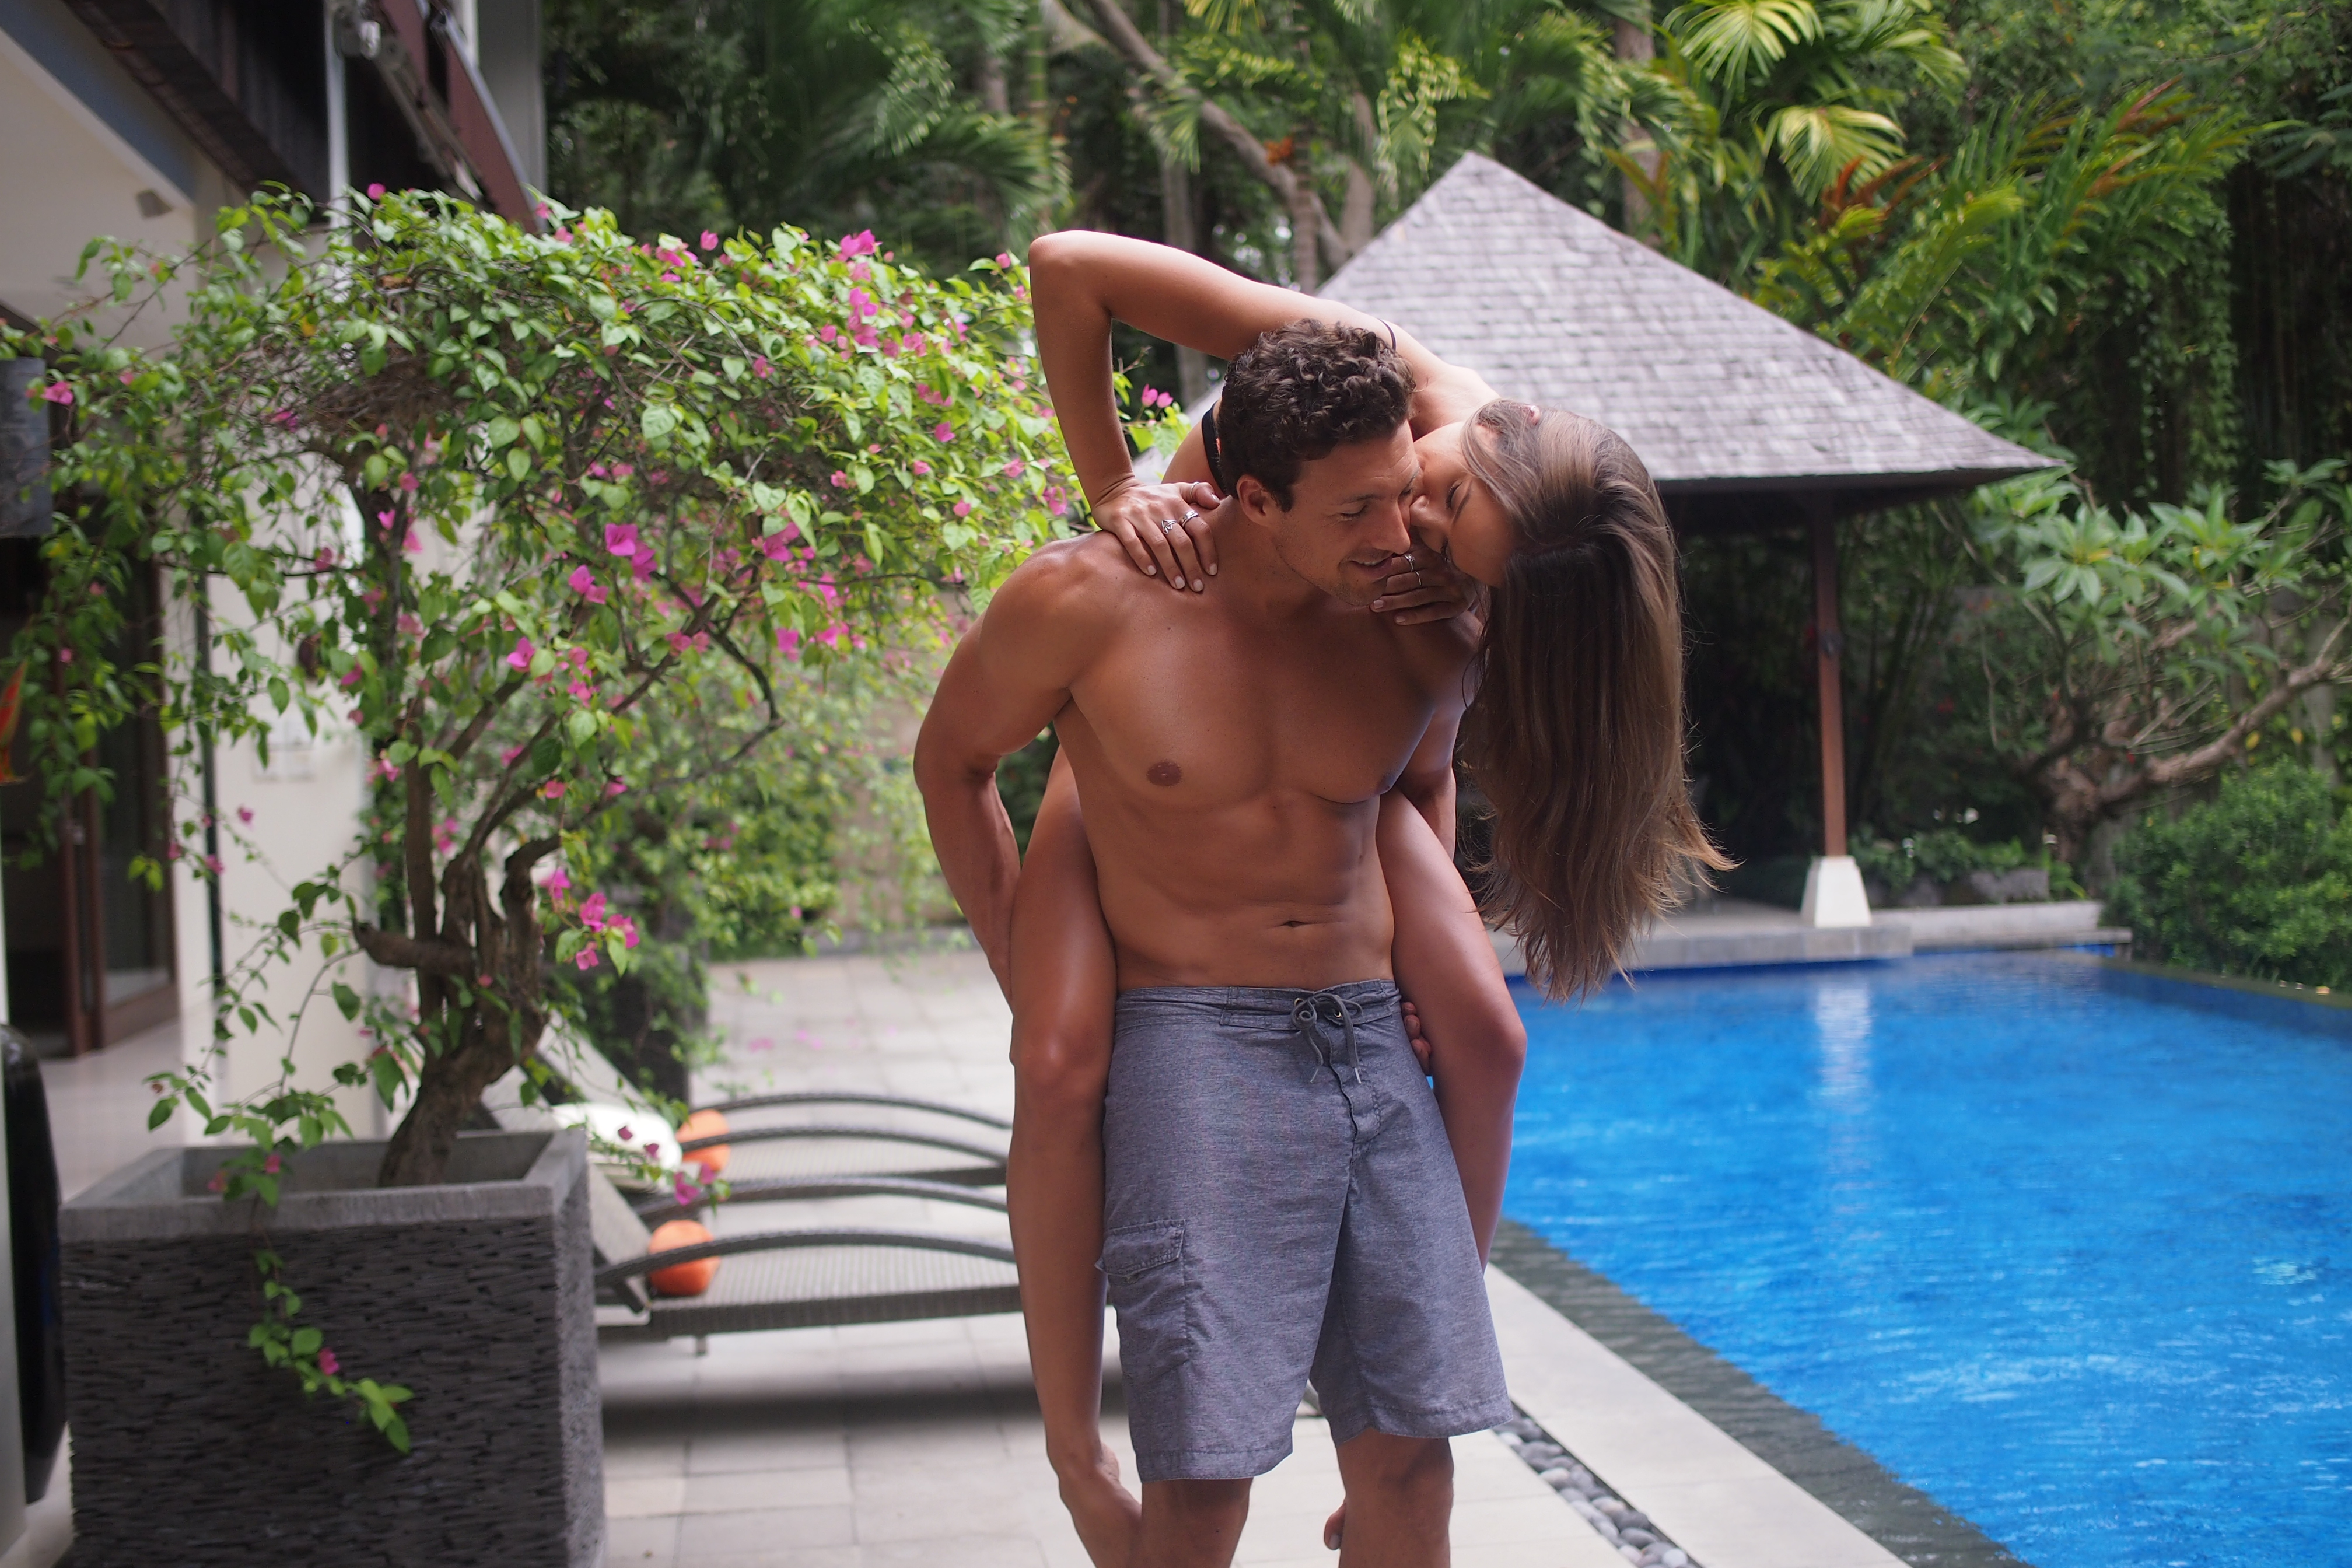 Villa Shinta Dewi Ubud, Villa Getaways, Bali Villas, Helen Owen, Zack kalter